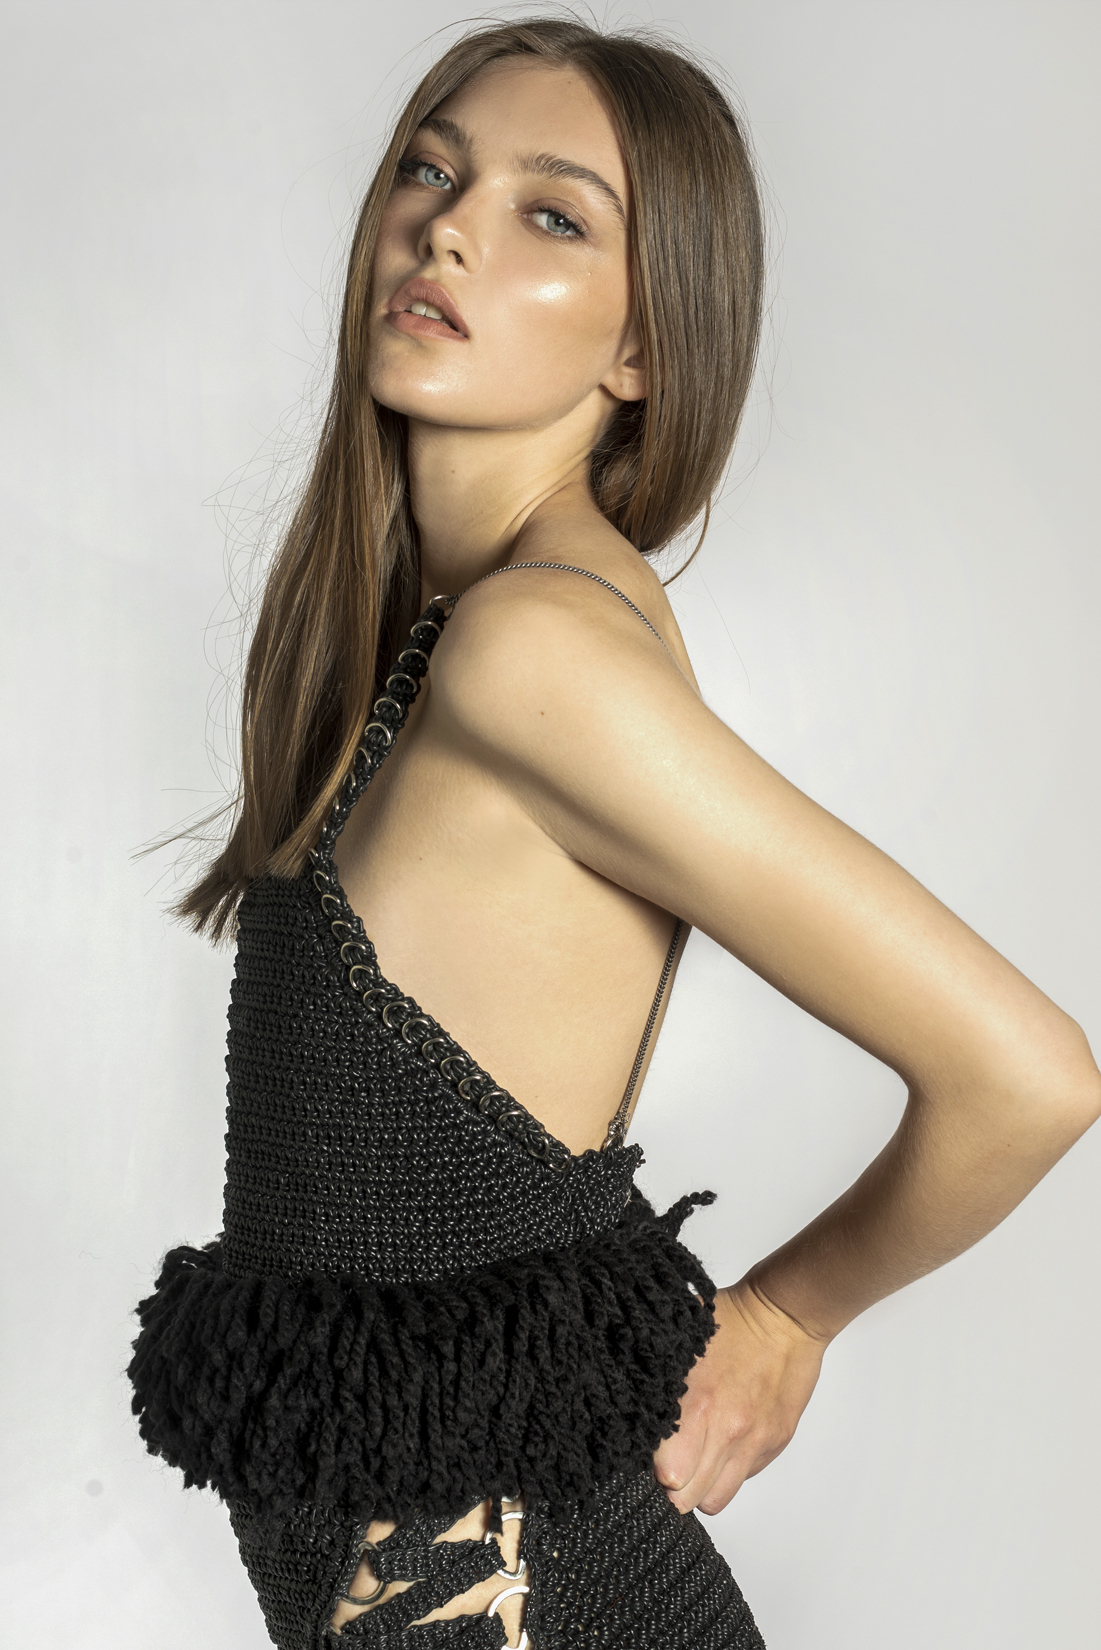 PROVE'M WRONG_11_niniz_corset.jpg